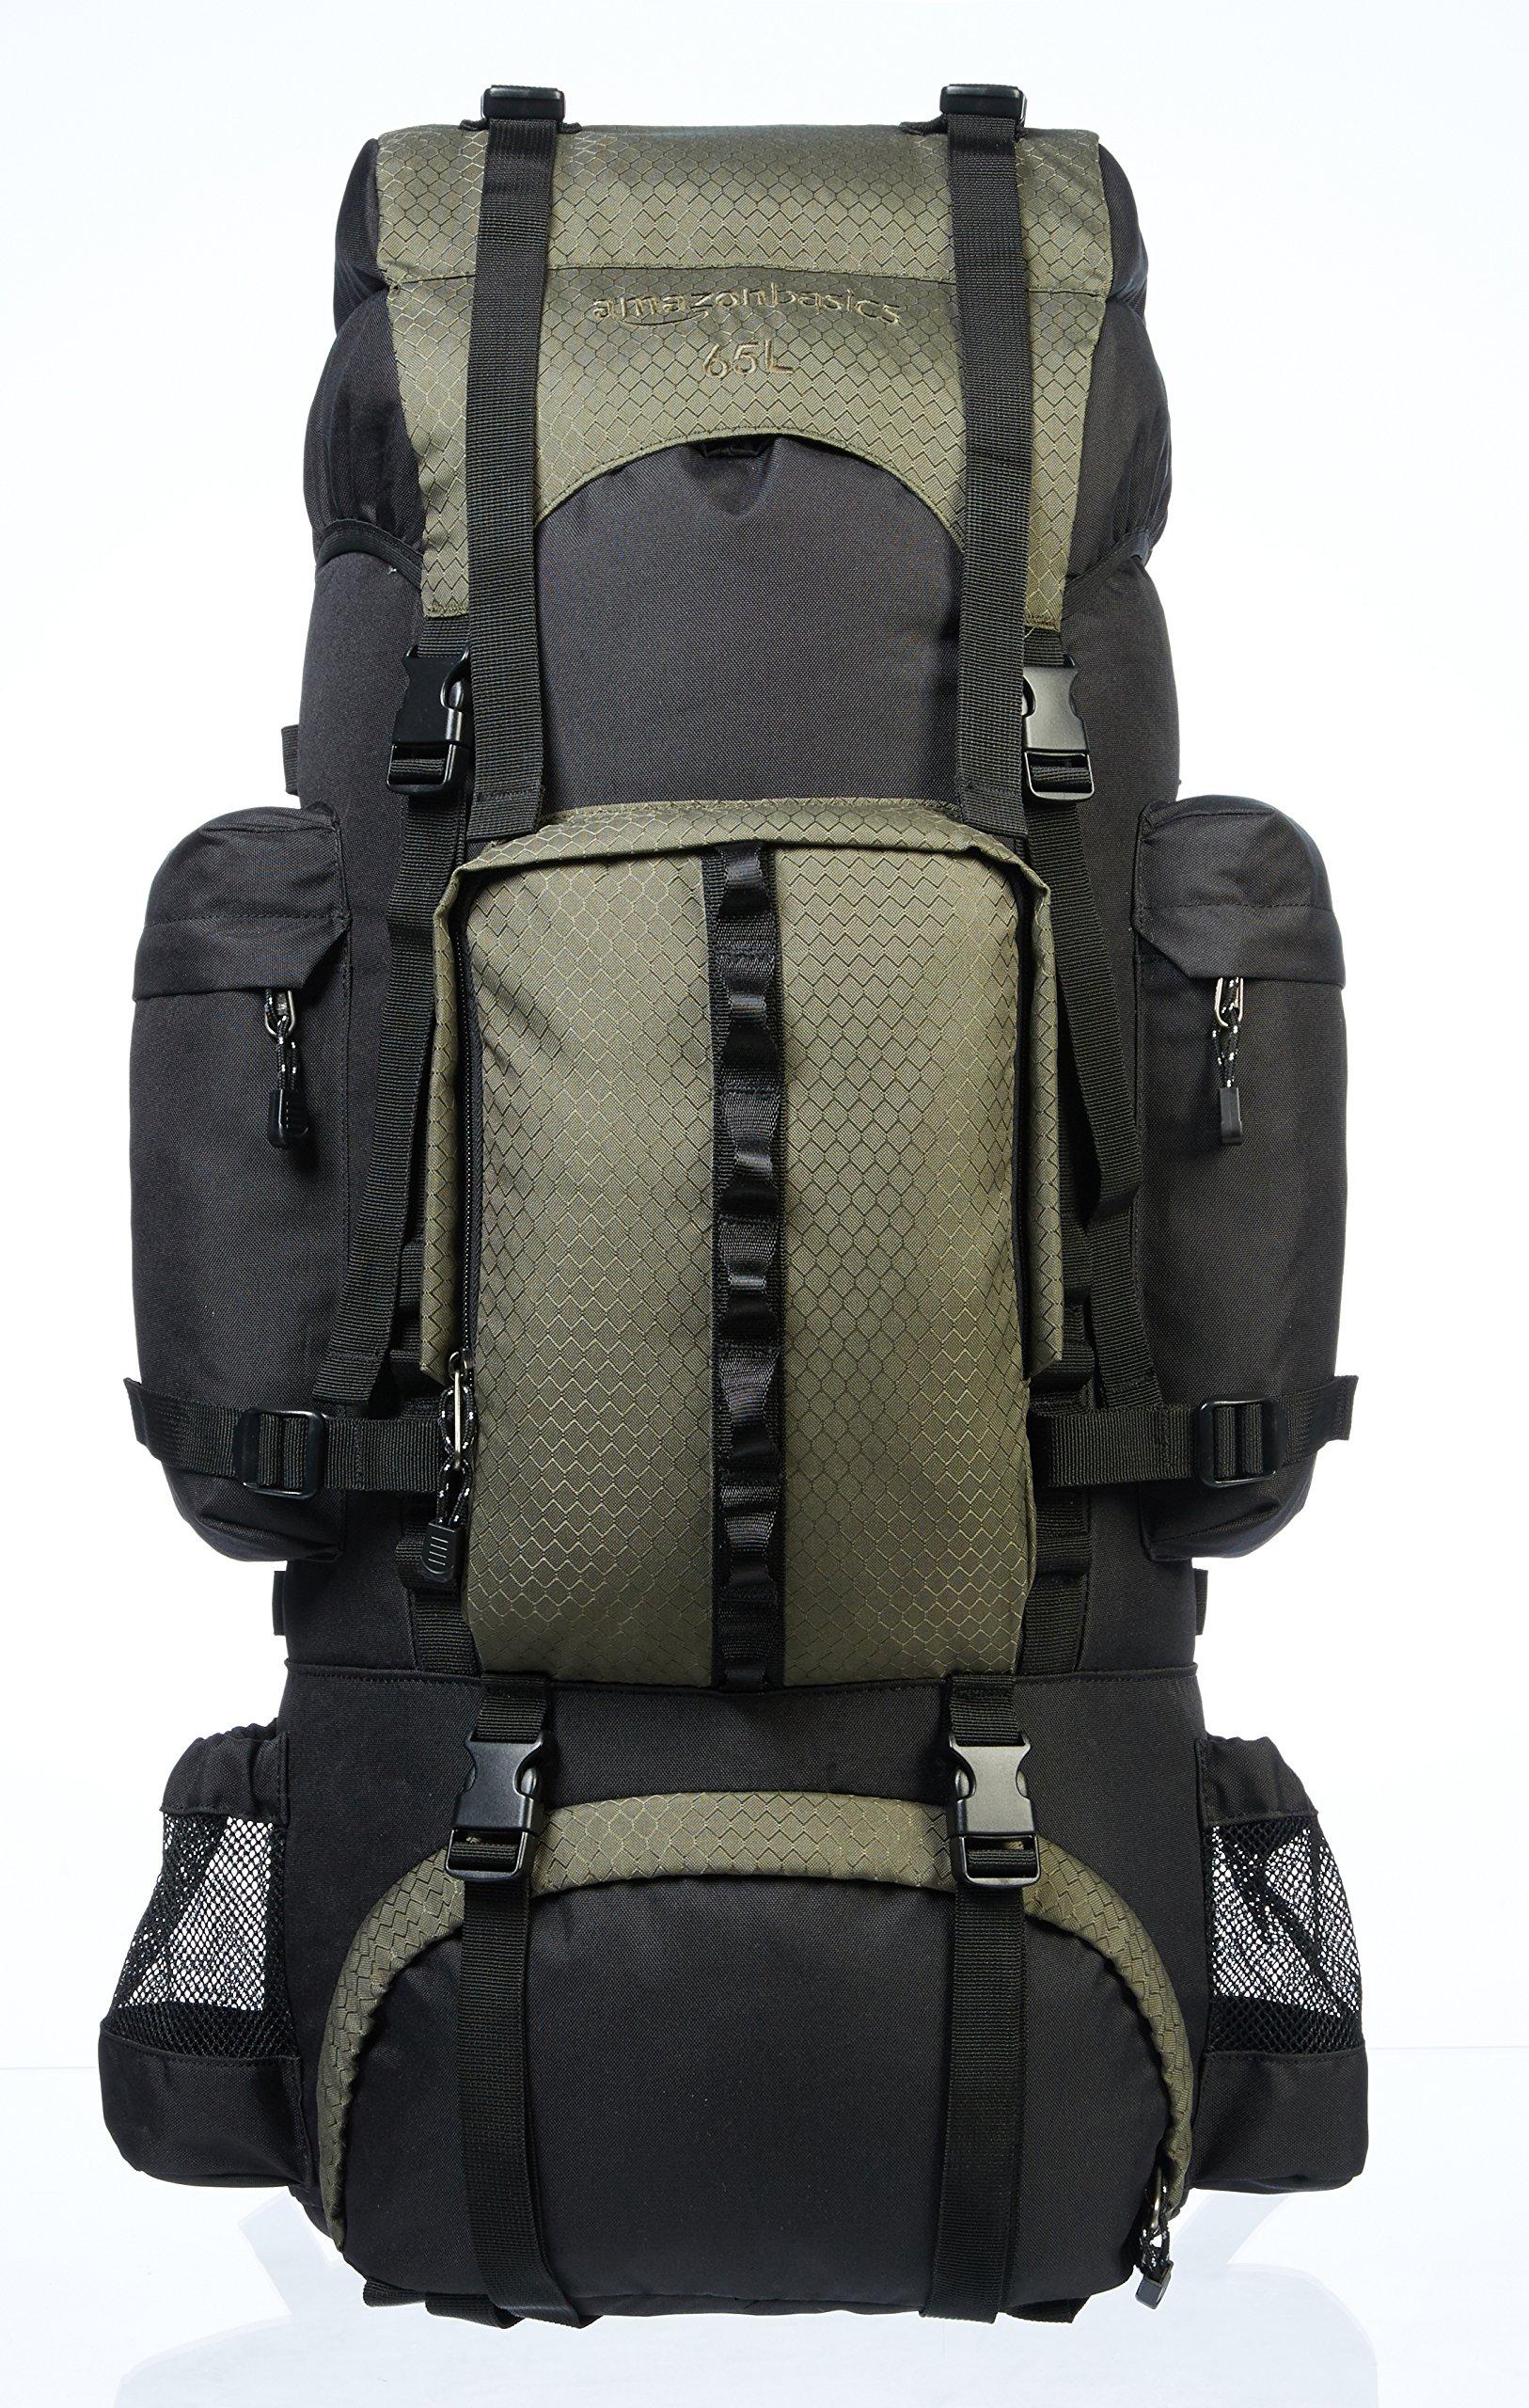 AmazonBasics Internal Hiking Backpack Rainfly